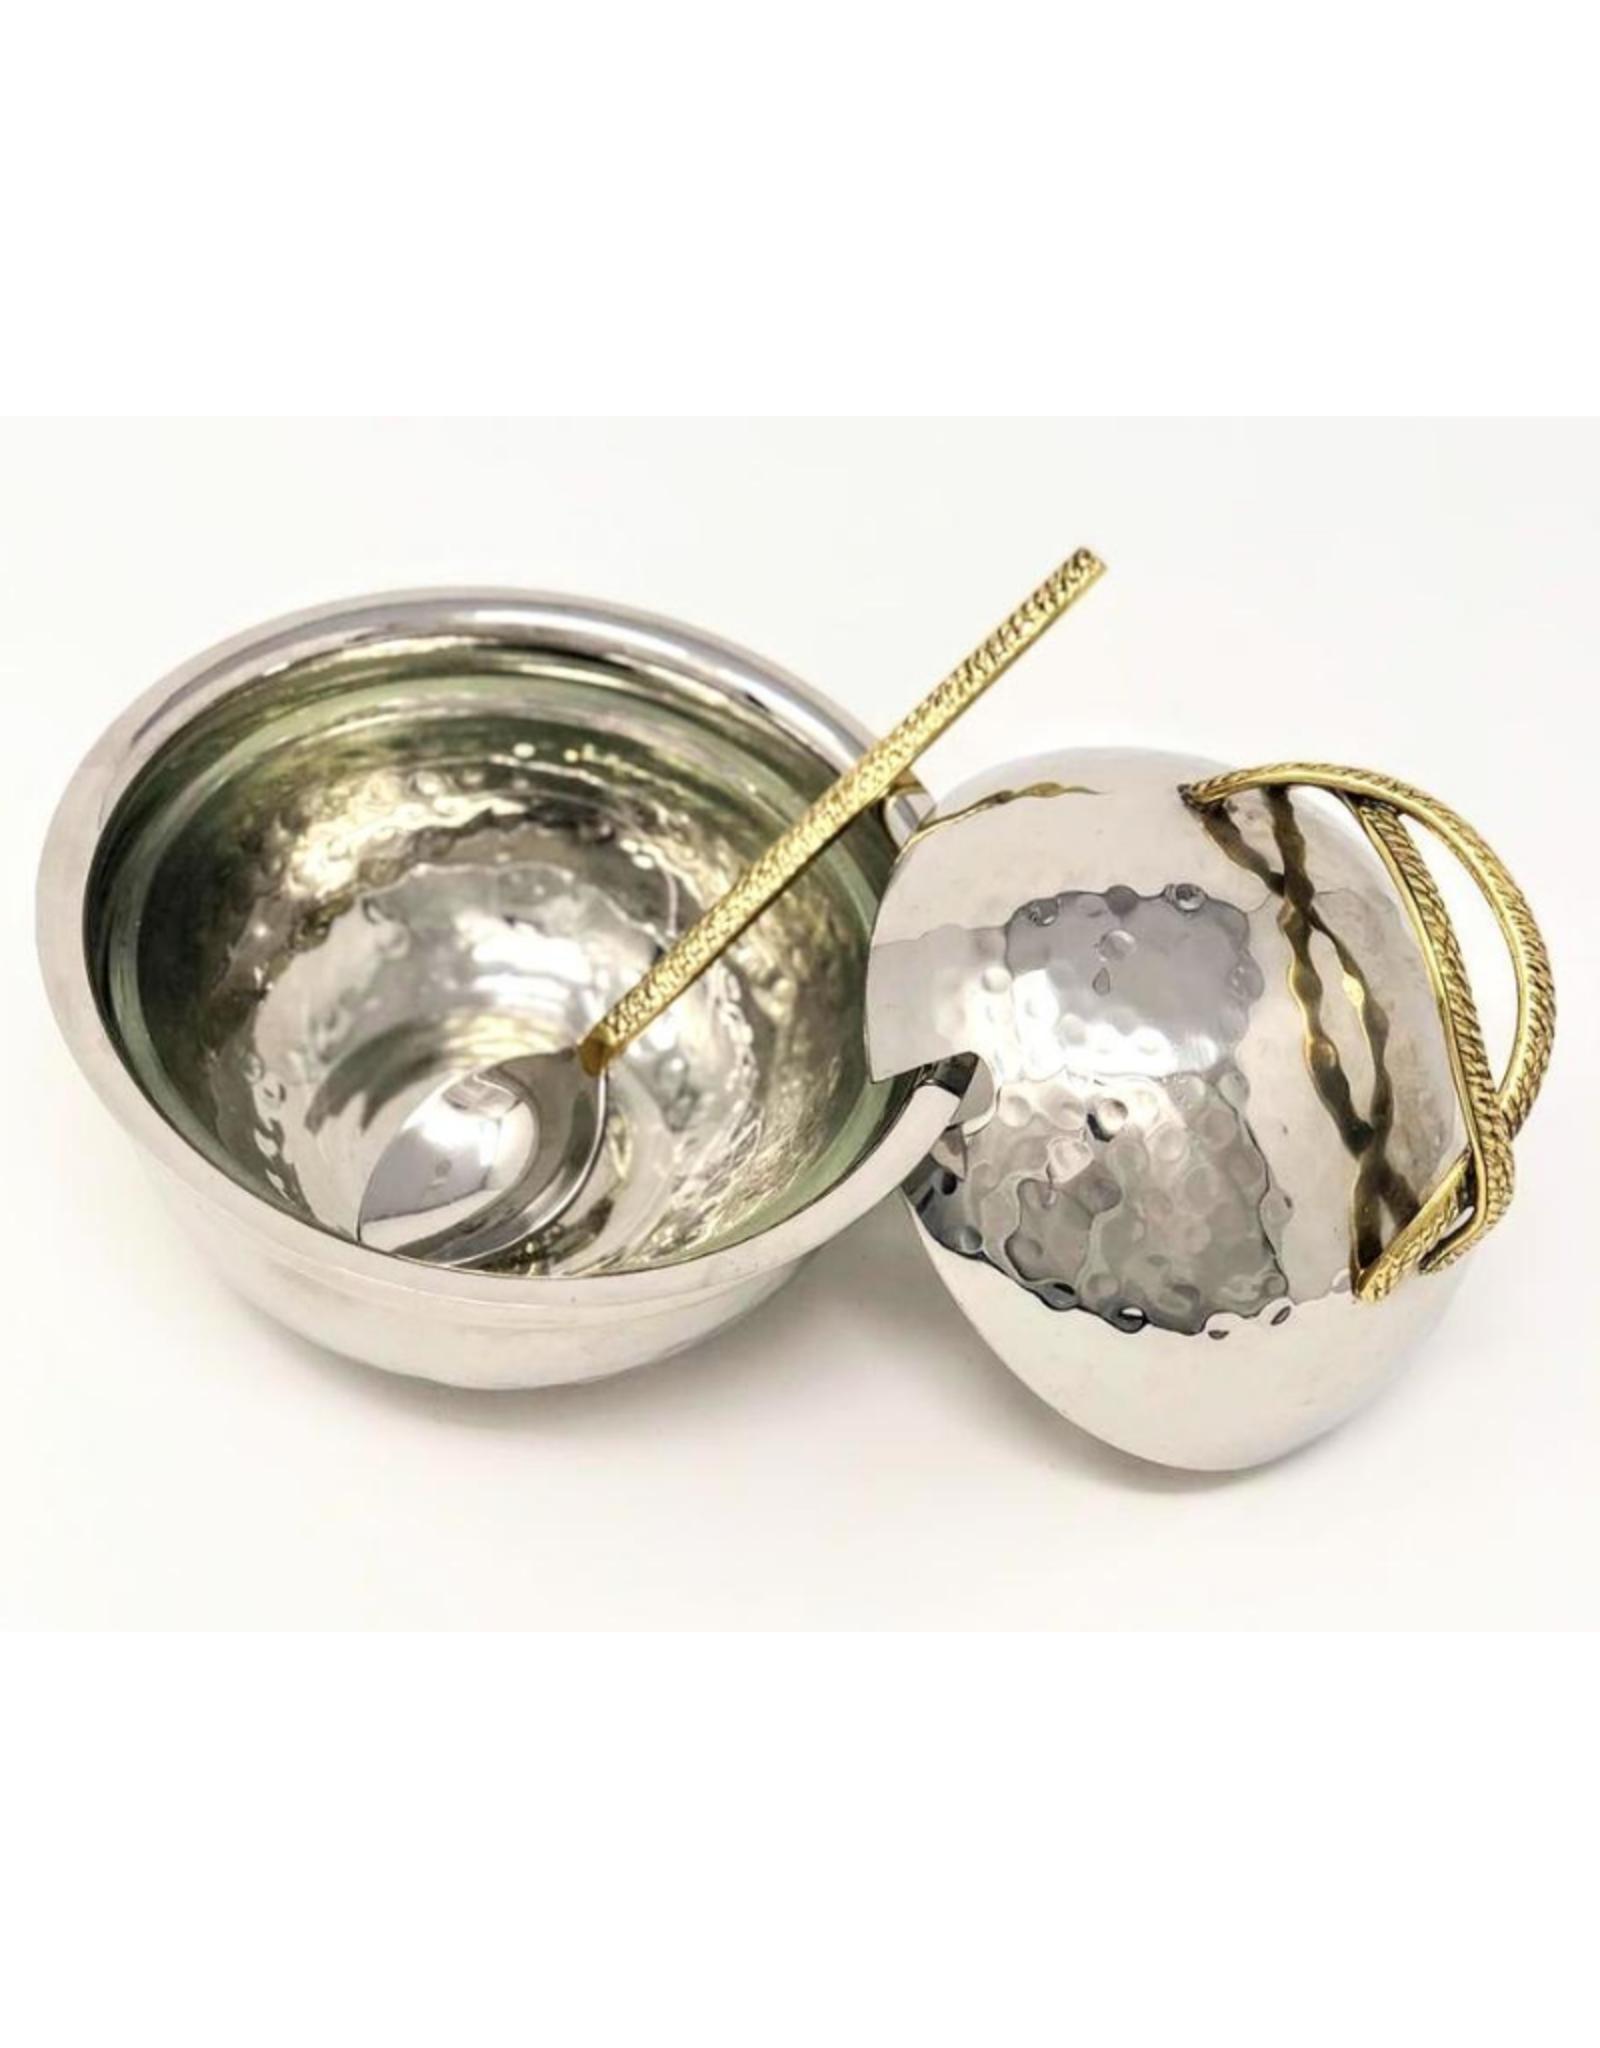 Rope Handle Honey Dish & Spoon